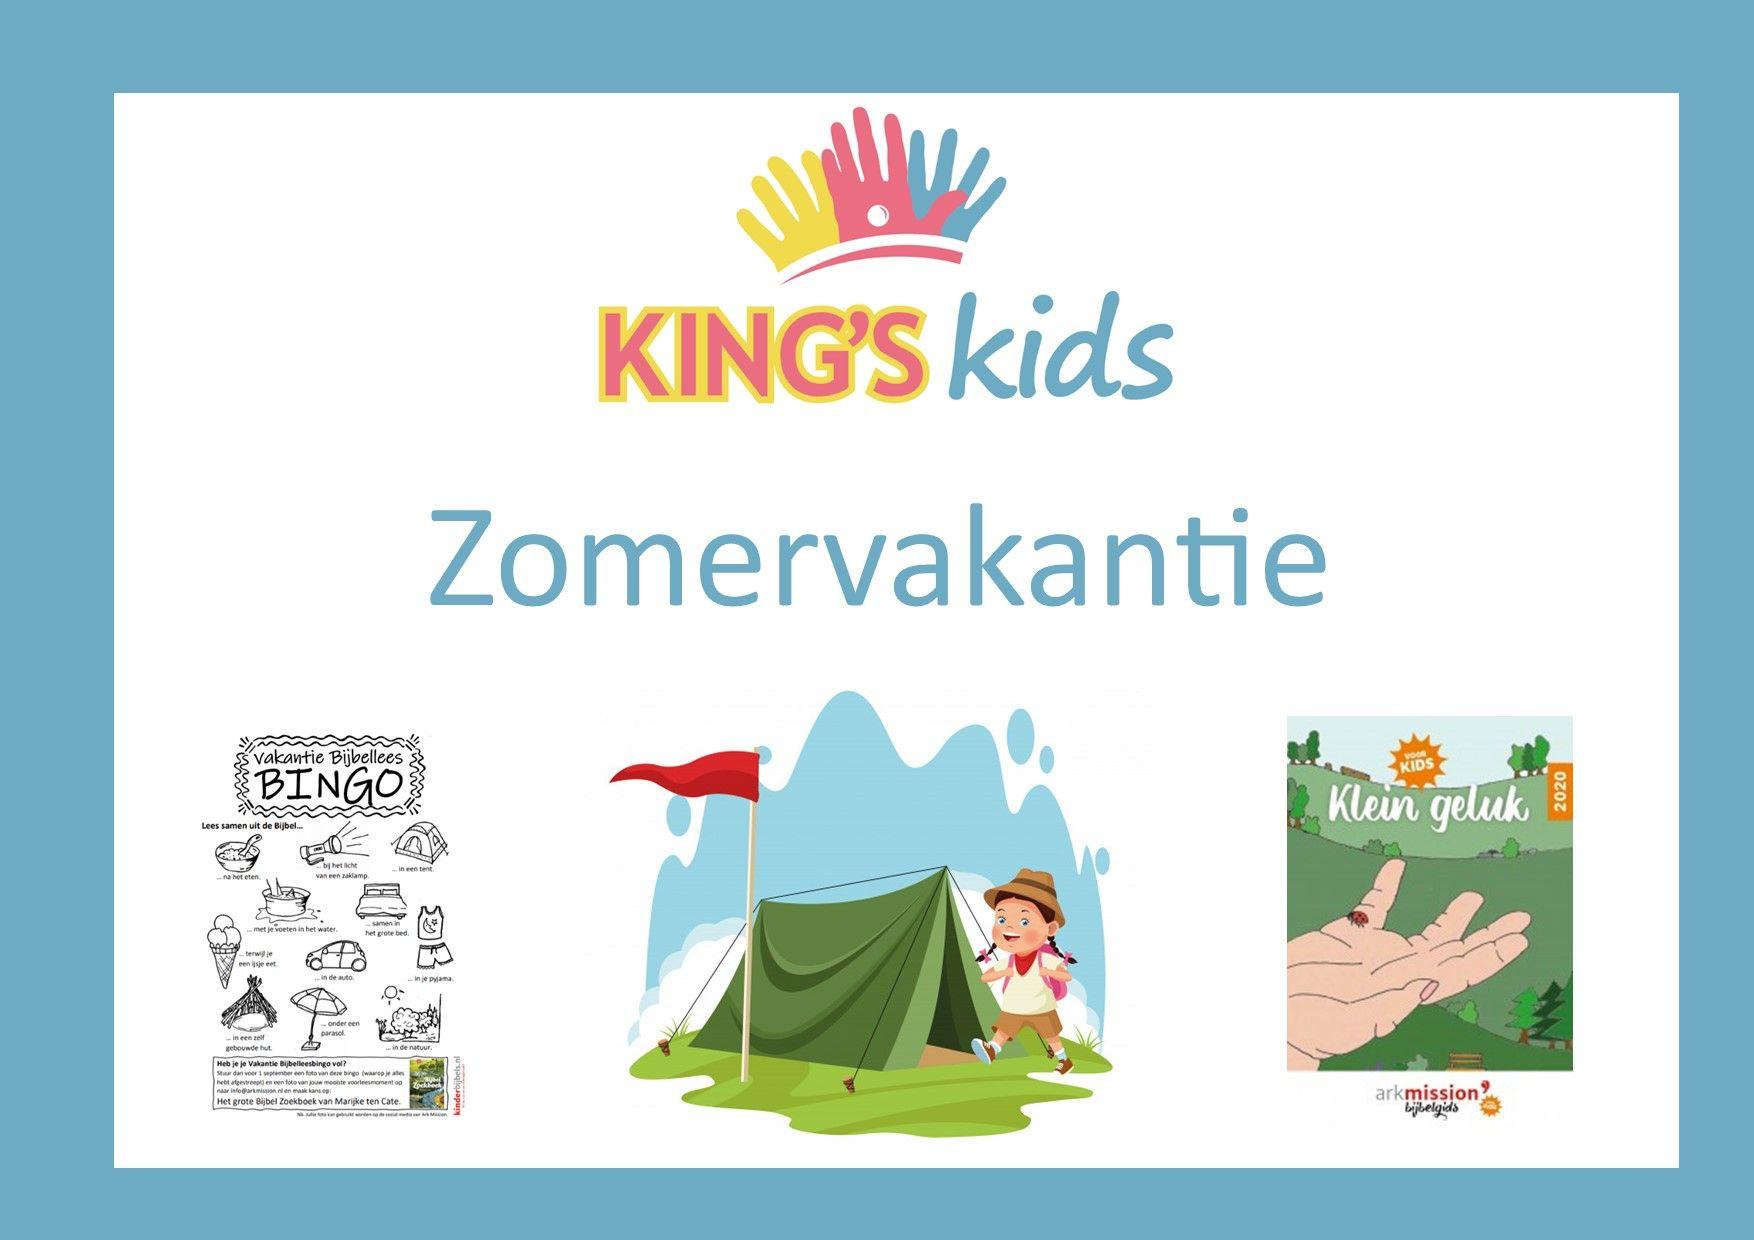 Kings Kids zomervakantie